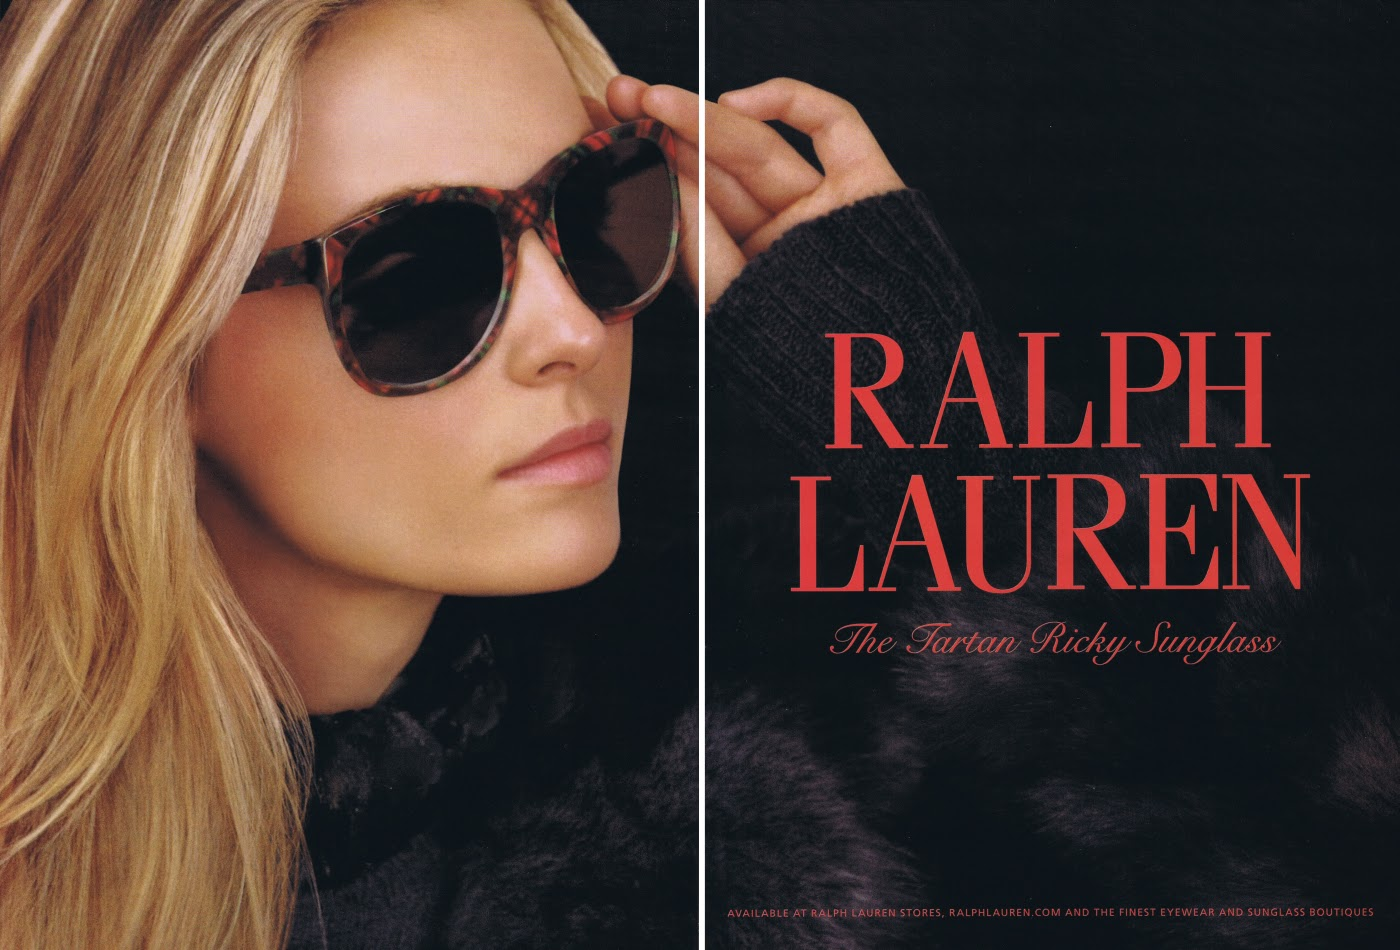 http://1.bp.blogspot.com/_ABlbqMVdpPc/TNrFds9zQMI/AAAAAAAAAfY/paRLE-icRzU/s1600/RL+Tartan+Sunglasses.jpg